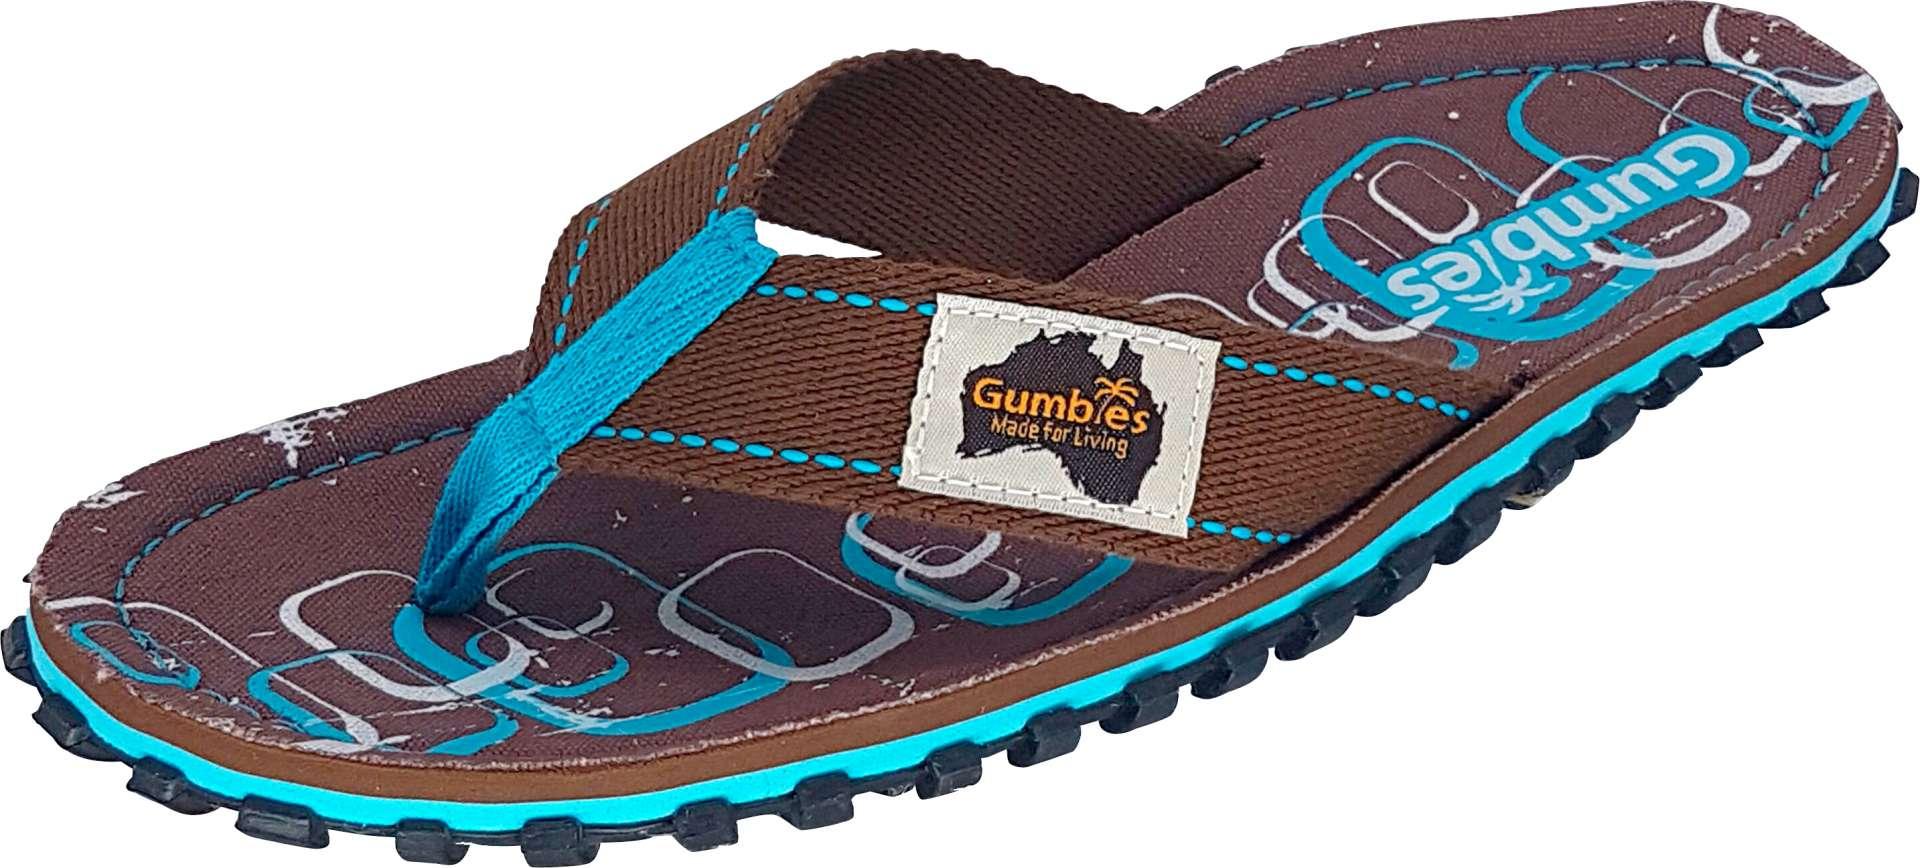 Gumbies Zehenstegsandale Spangle | 00614961614604